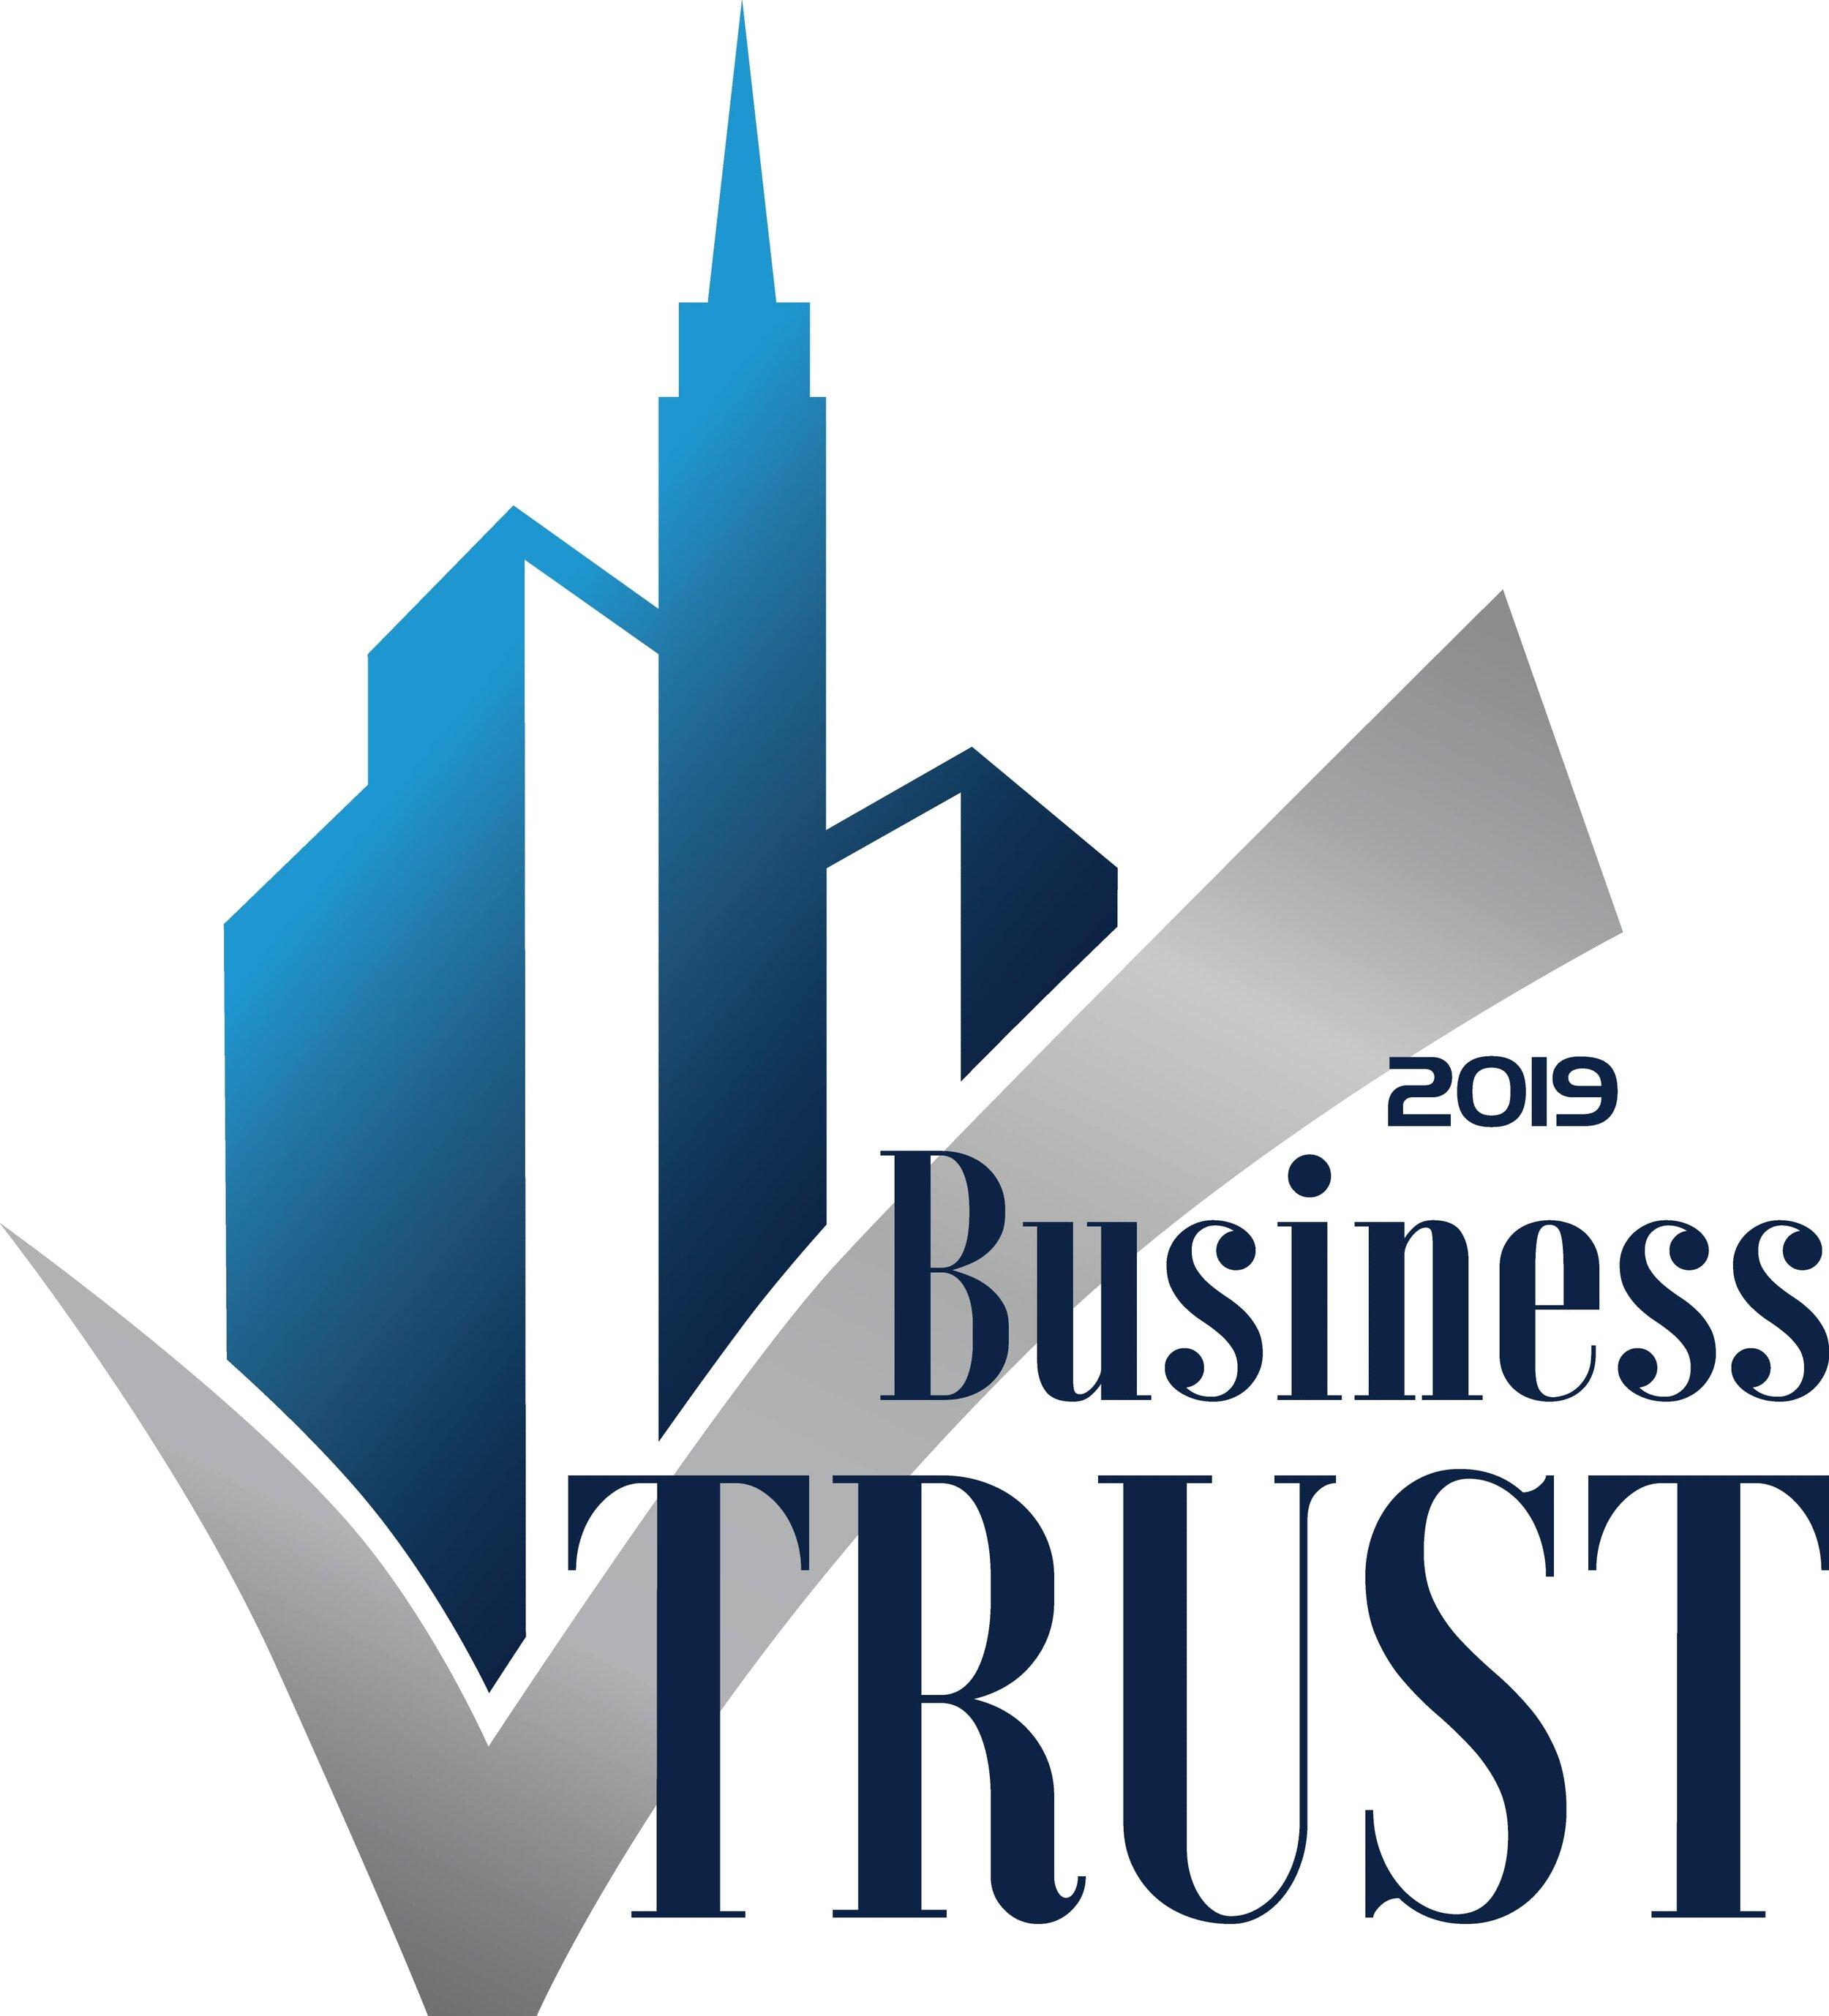 Business Trust 2019.png.jpg